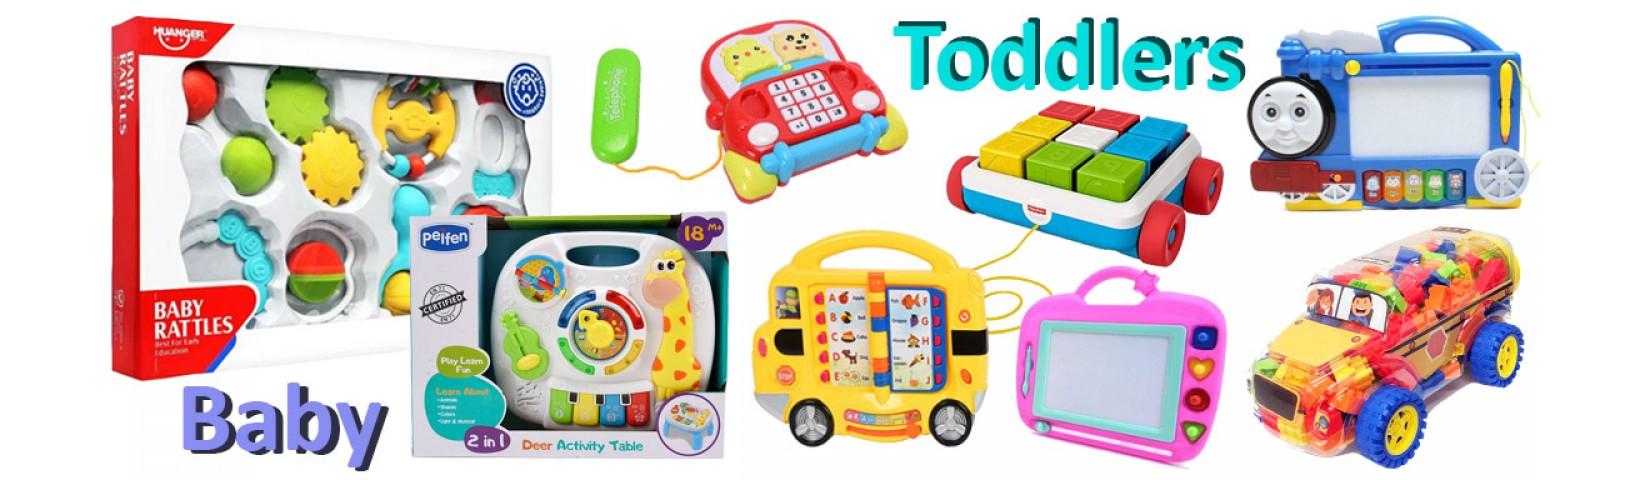 2021 Baby Toys